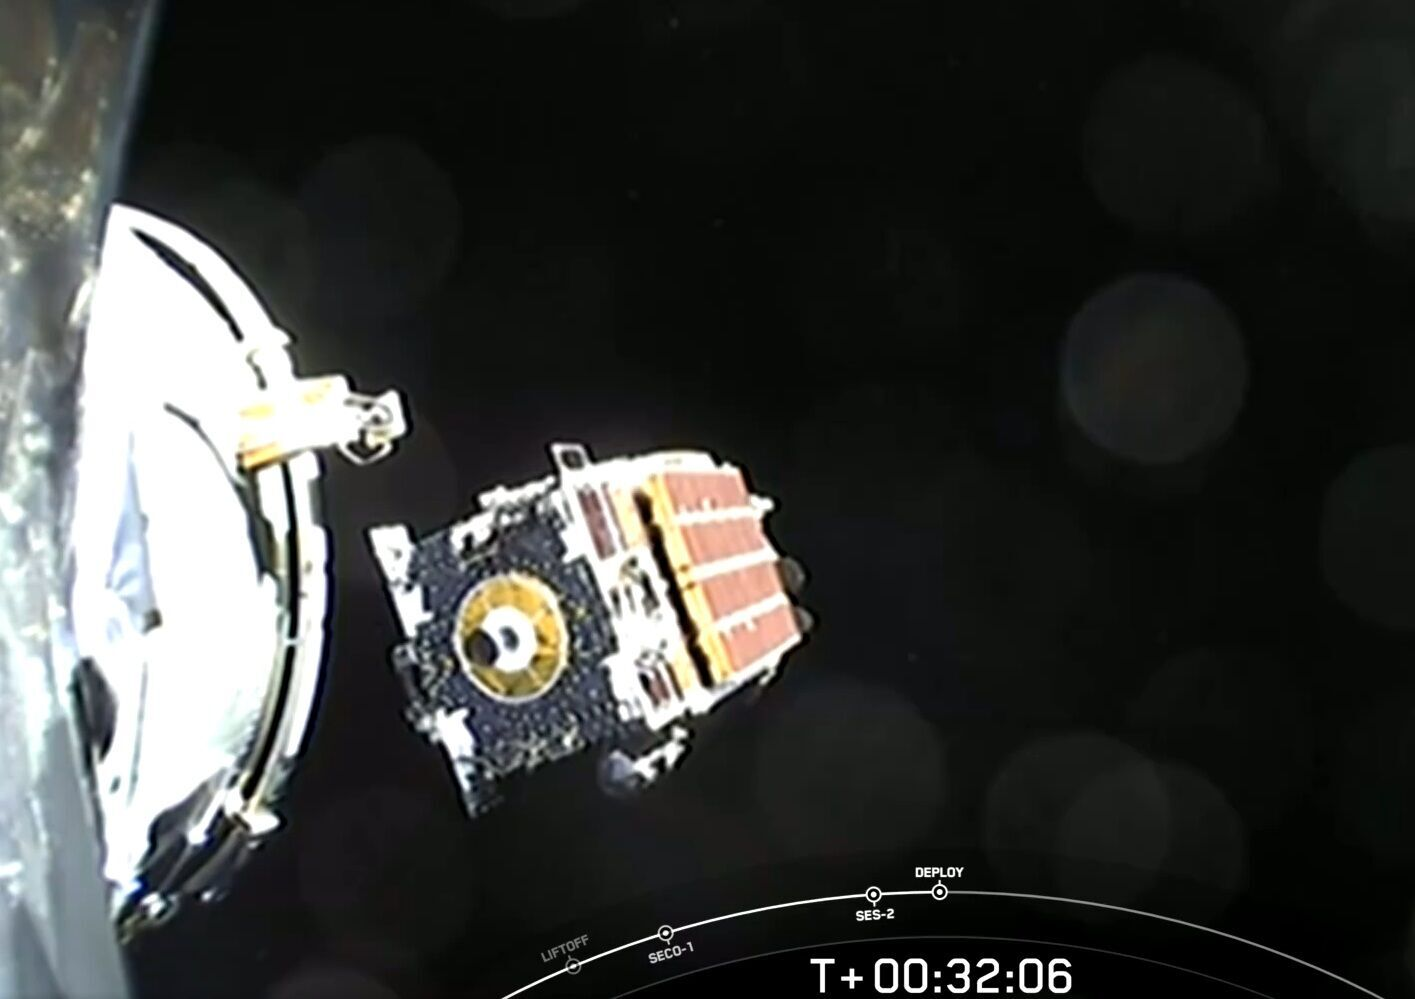 Спутник вышел на орбиту Земли.